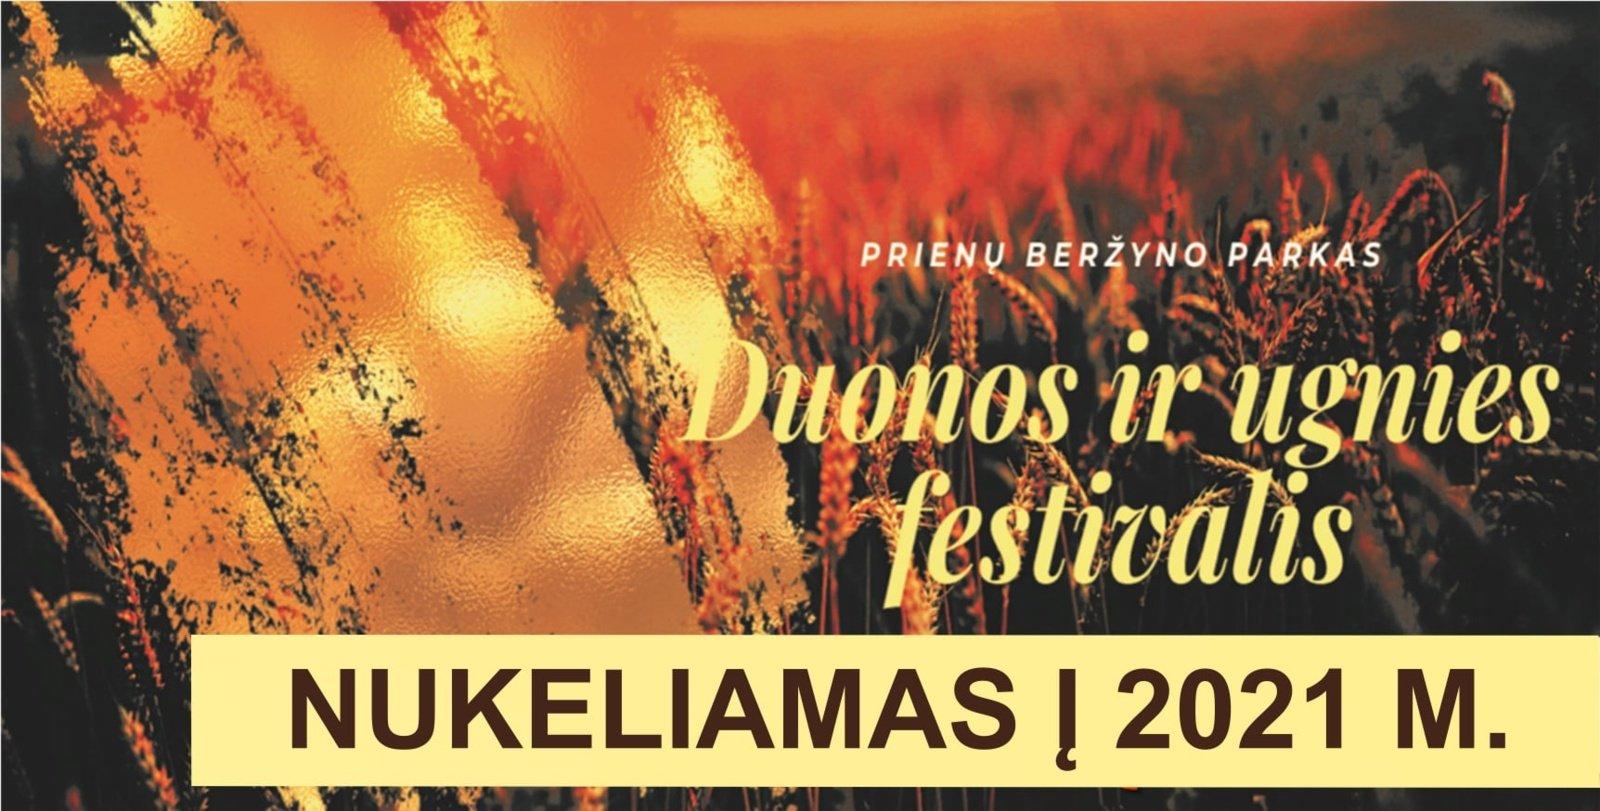 Duonos ir ugnies festivalis šiemet neįvyks